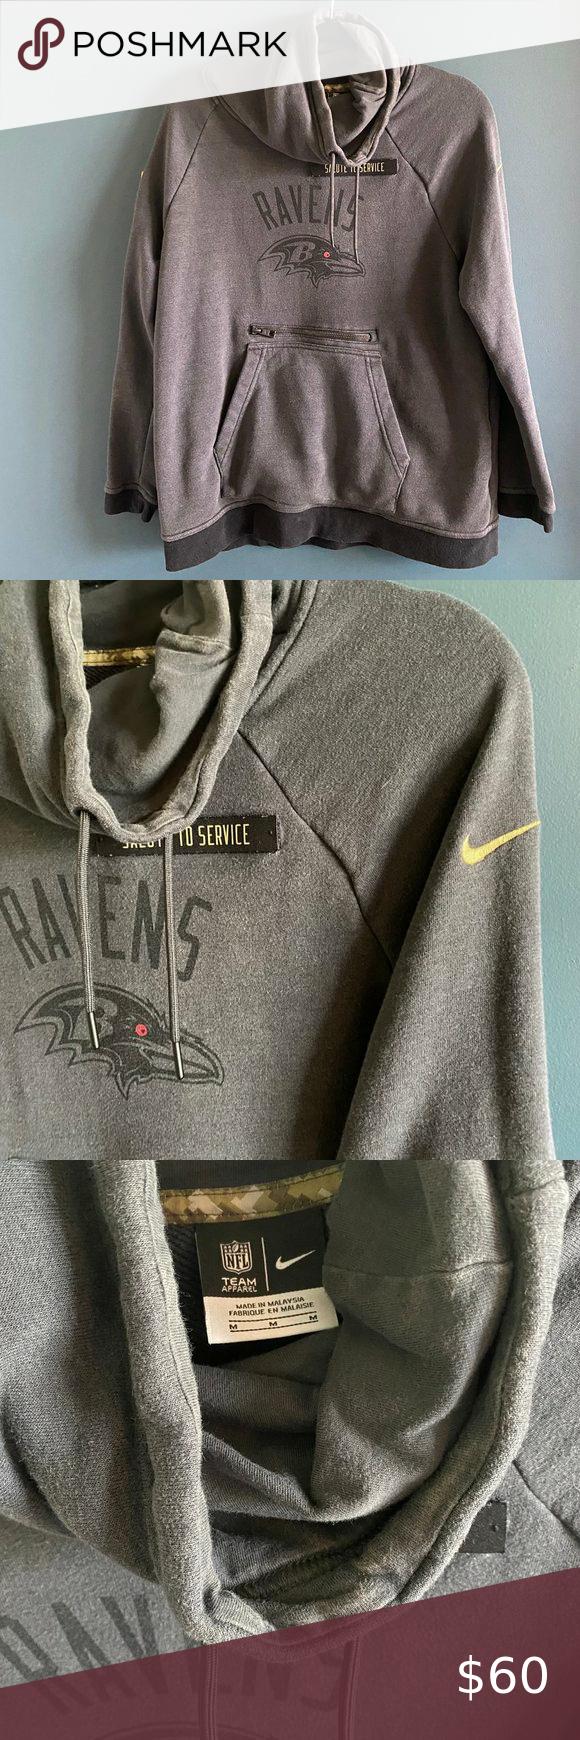 Predownload: Nike Nfl Baltimore Ravens Salute Sweatshirt Nike Nfl Sweatshirts American Flag Patch [ 1740 x 580 Pixel ]